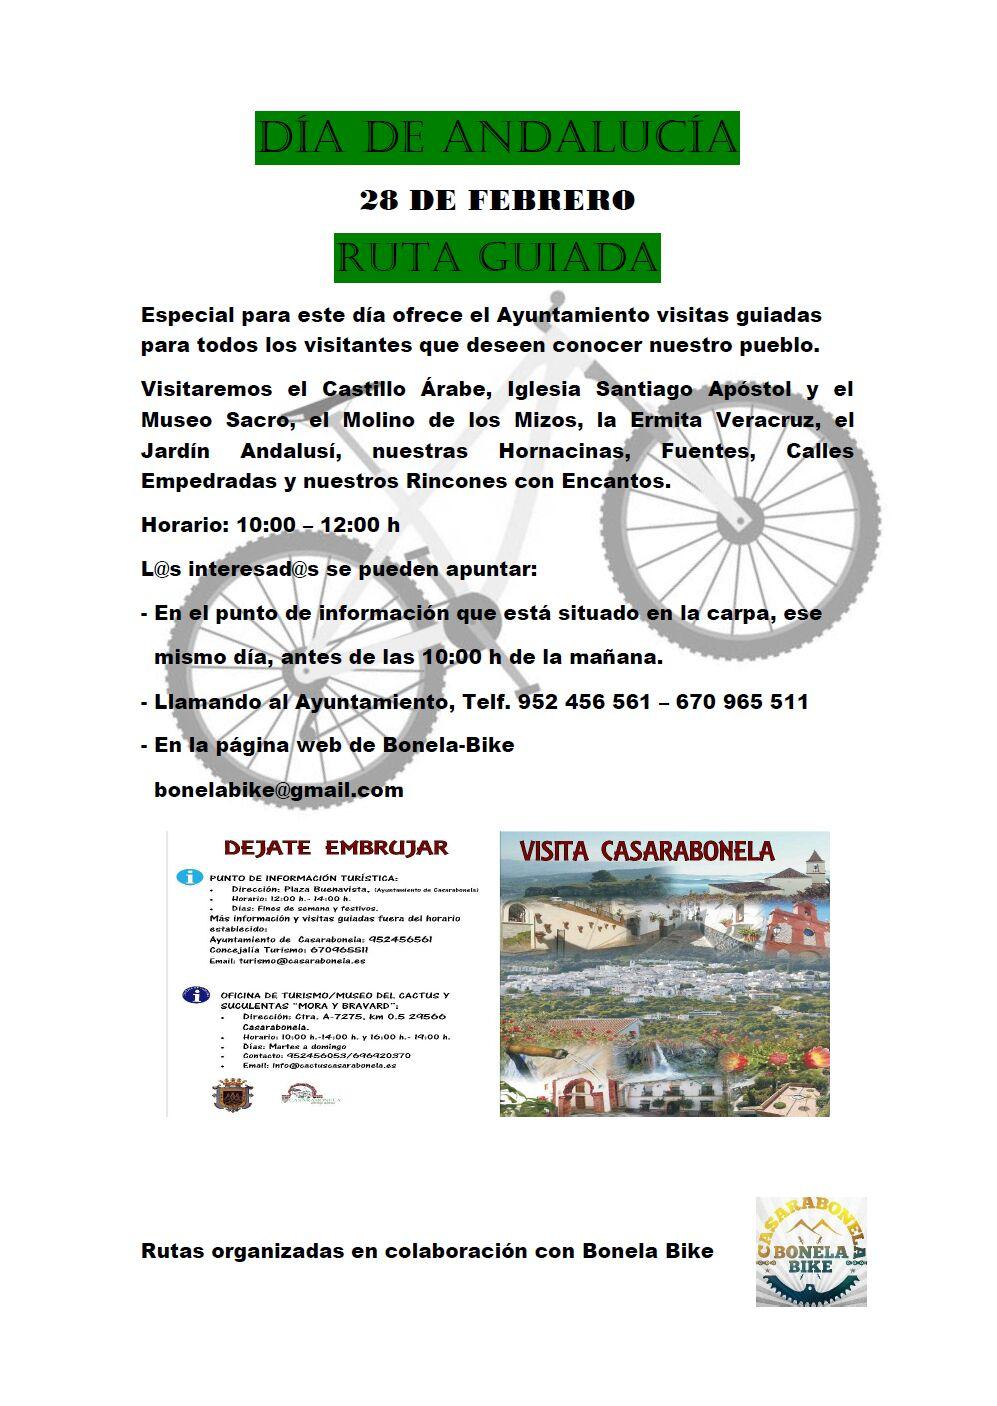 Visita Turismo Casarabonela. Gratis para acompañantes corredores Media Maratón BTT 28 Febrero 2020